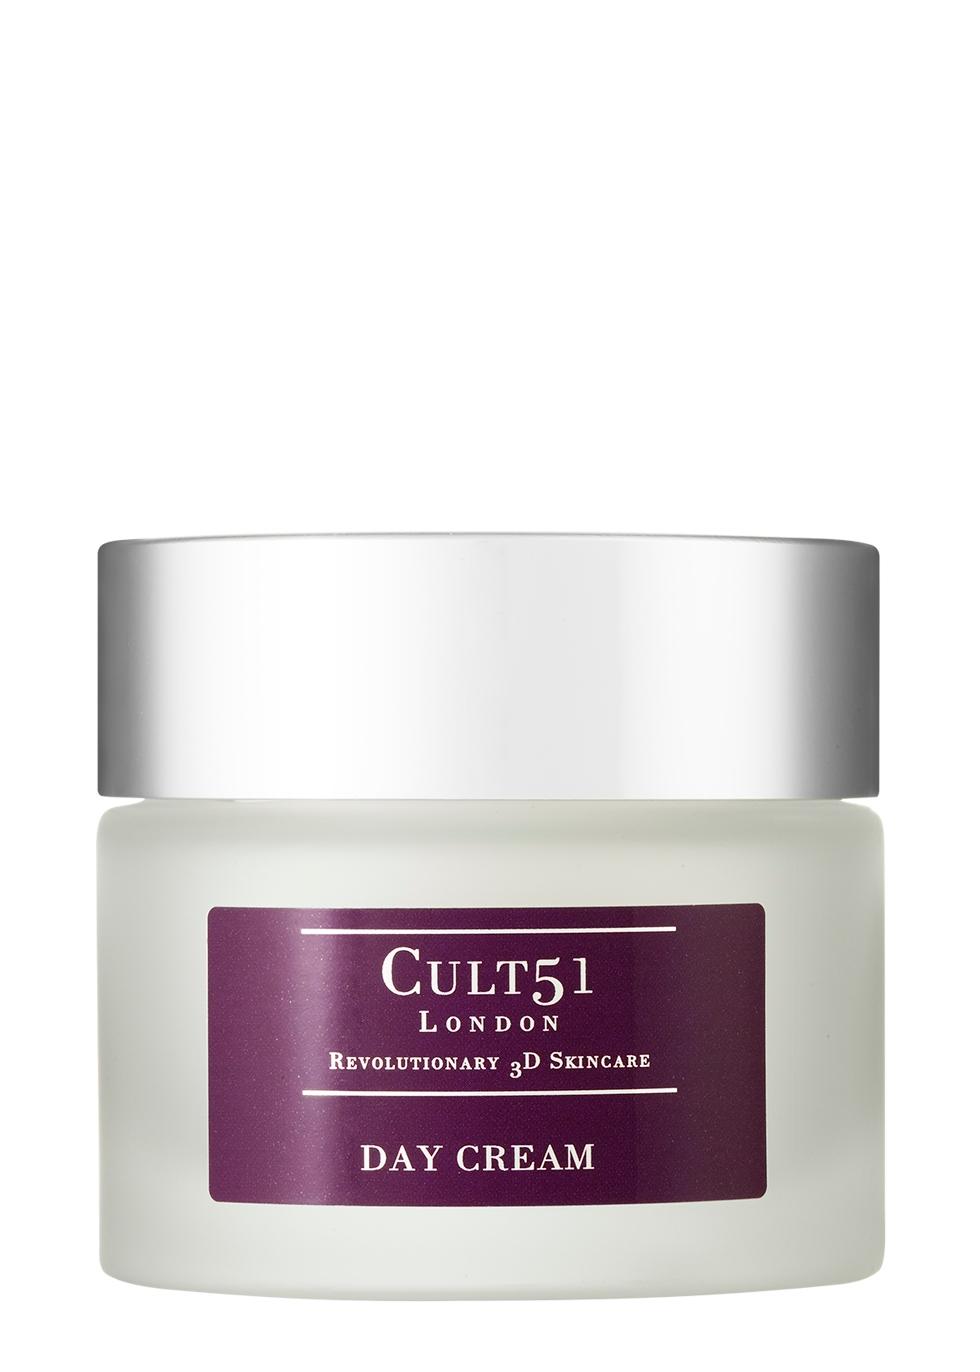 Day Cream 50ml